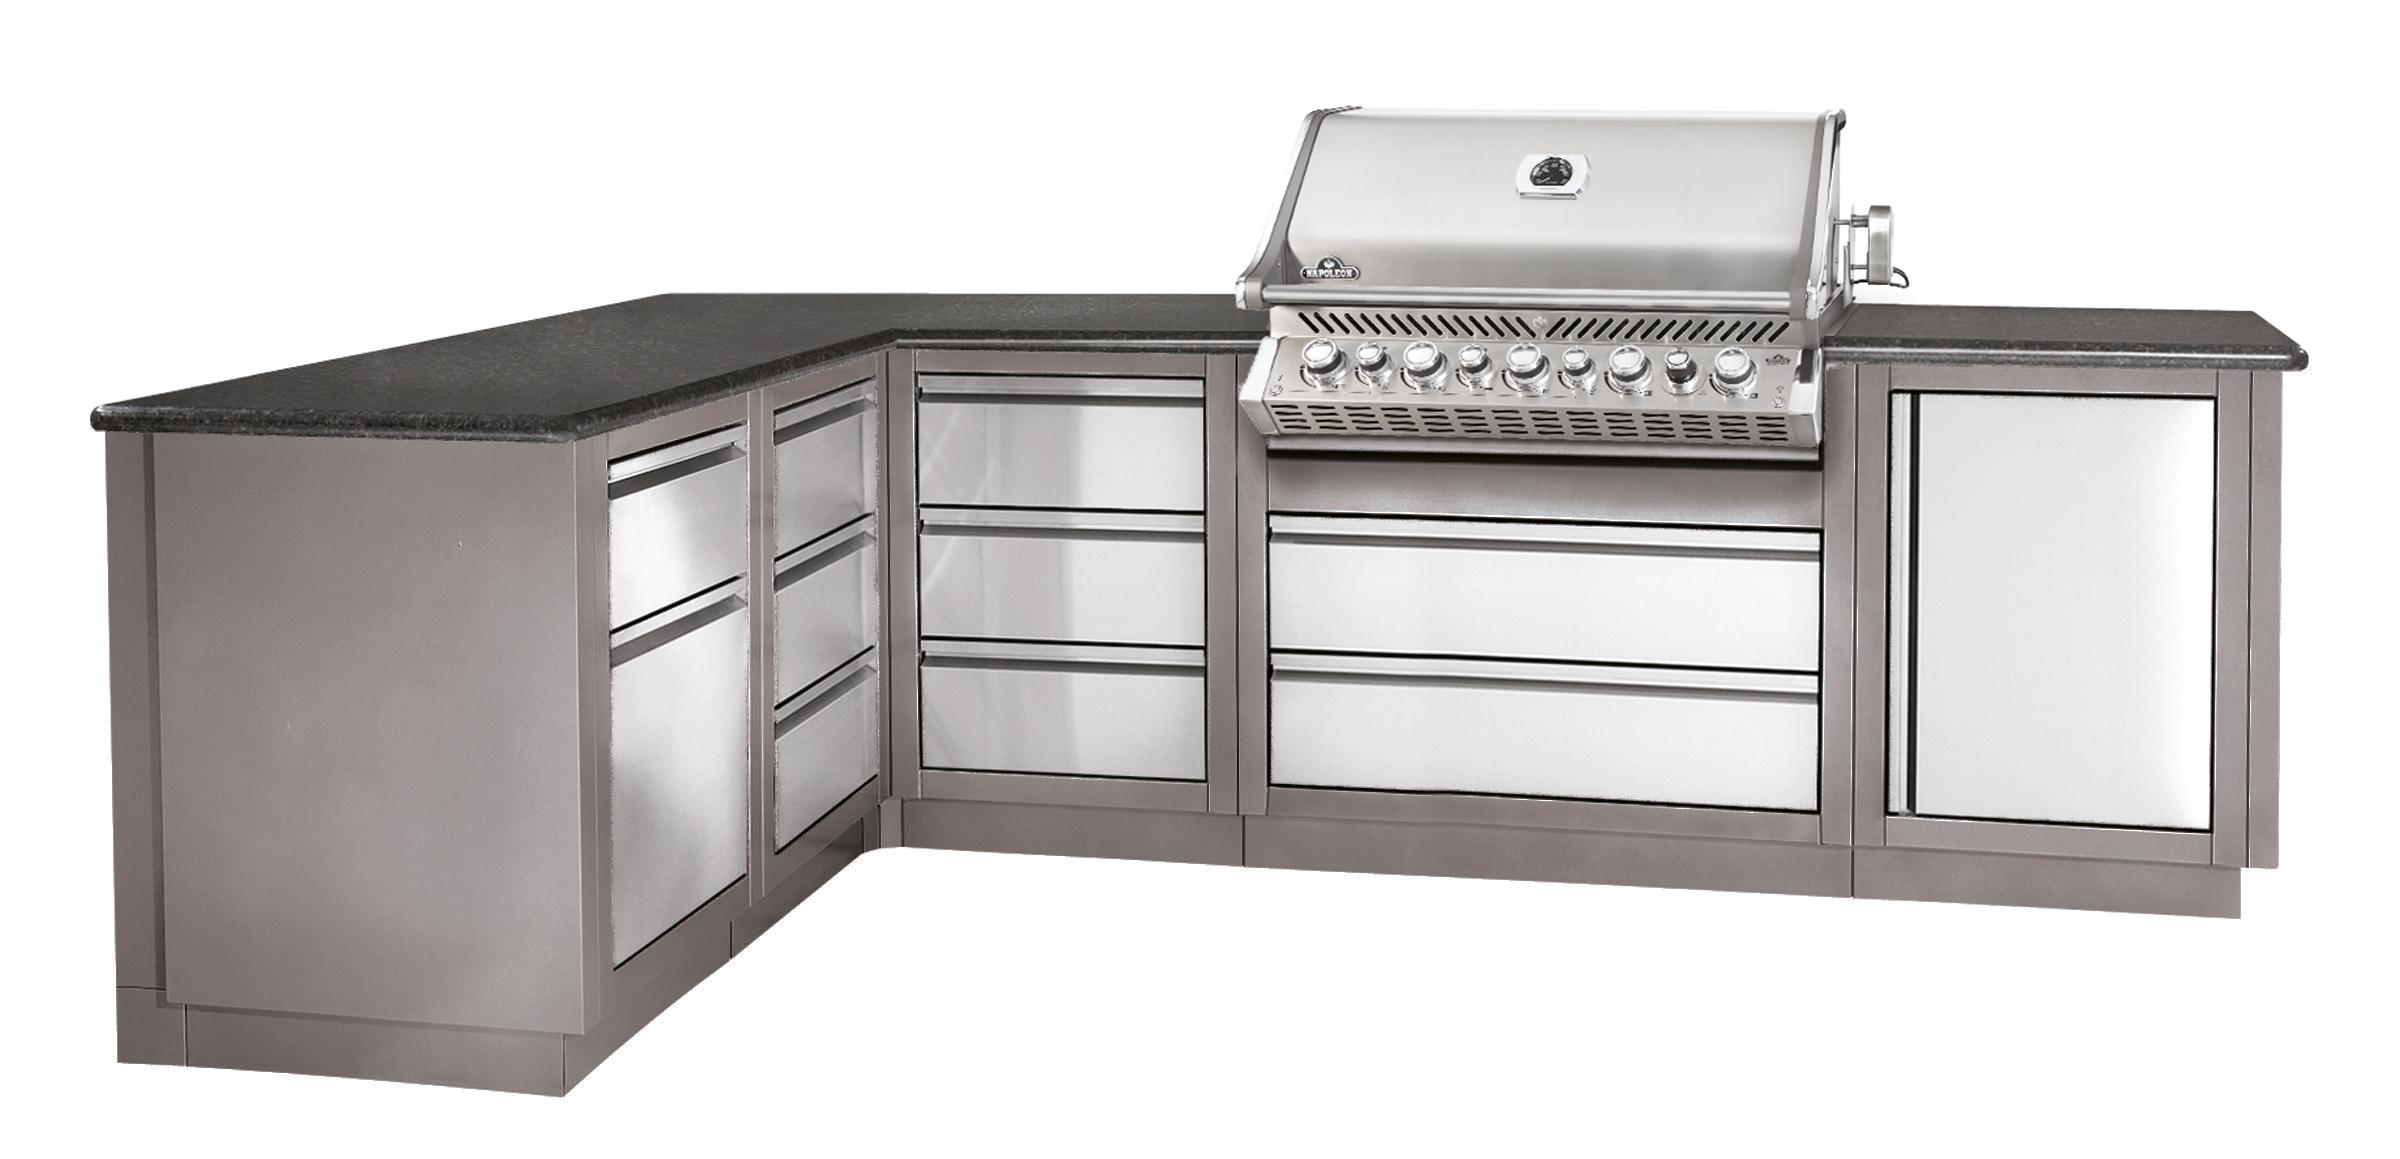 napoleon oasis 300 mit bi pro 665 rb nss erdgas jetzzt kaufen grill concept. Black Bedroom Furniture Sets. Home Design Ideas